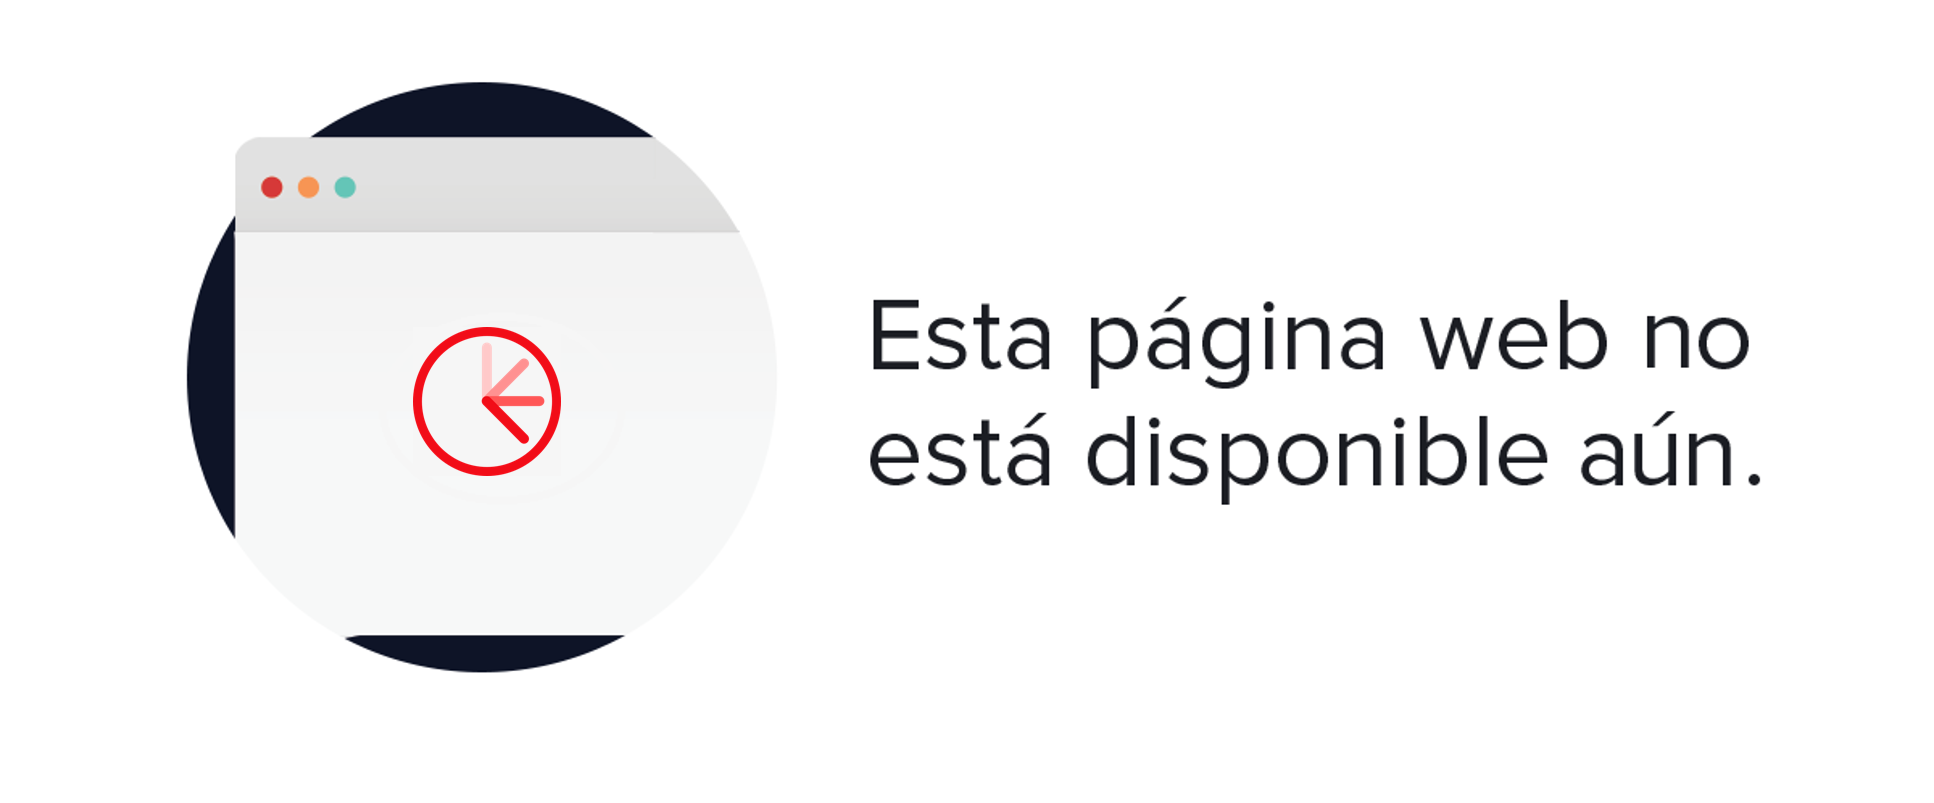 Drkshdw Gris Intermedio Zapatillas Deportivas Hombre 463729 - Barato - LJVJDBC